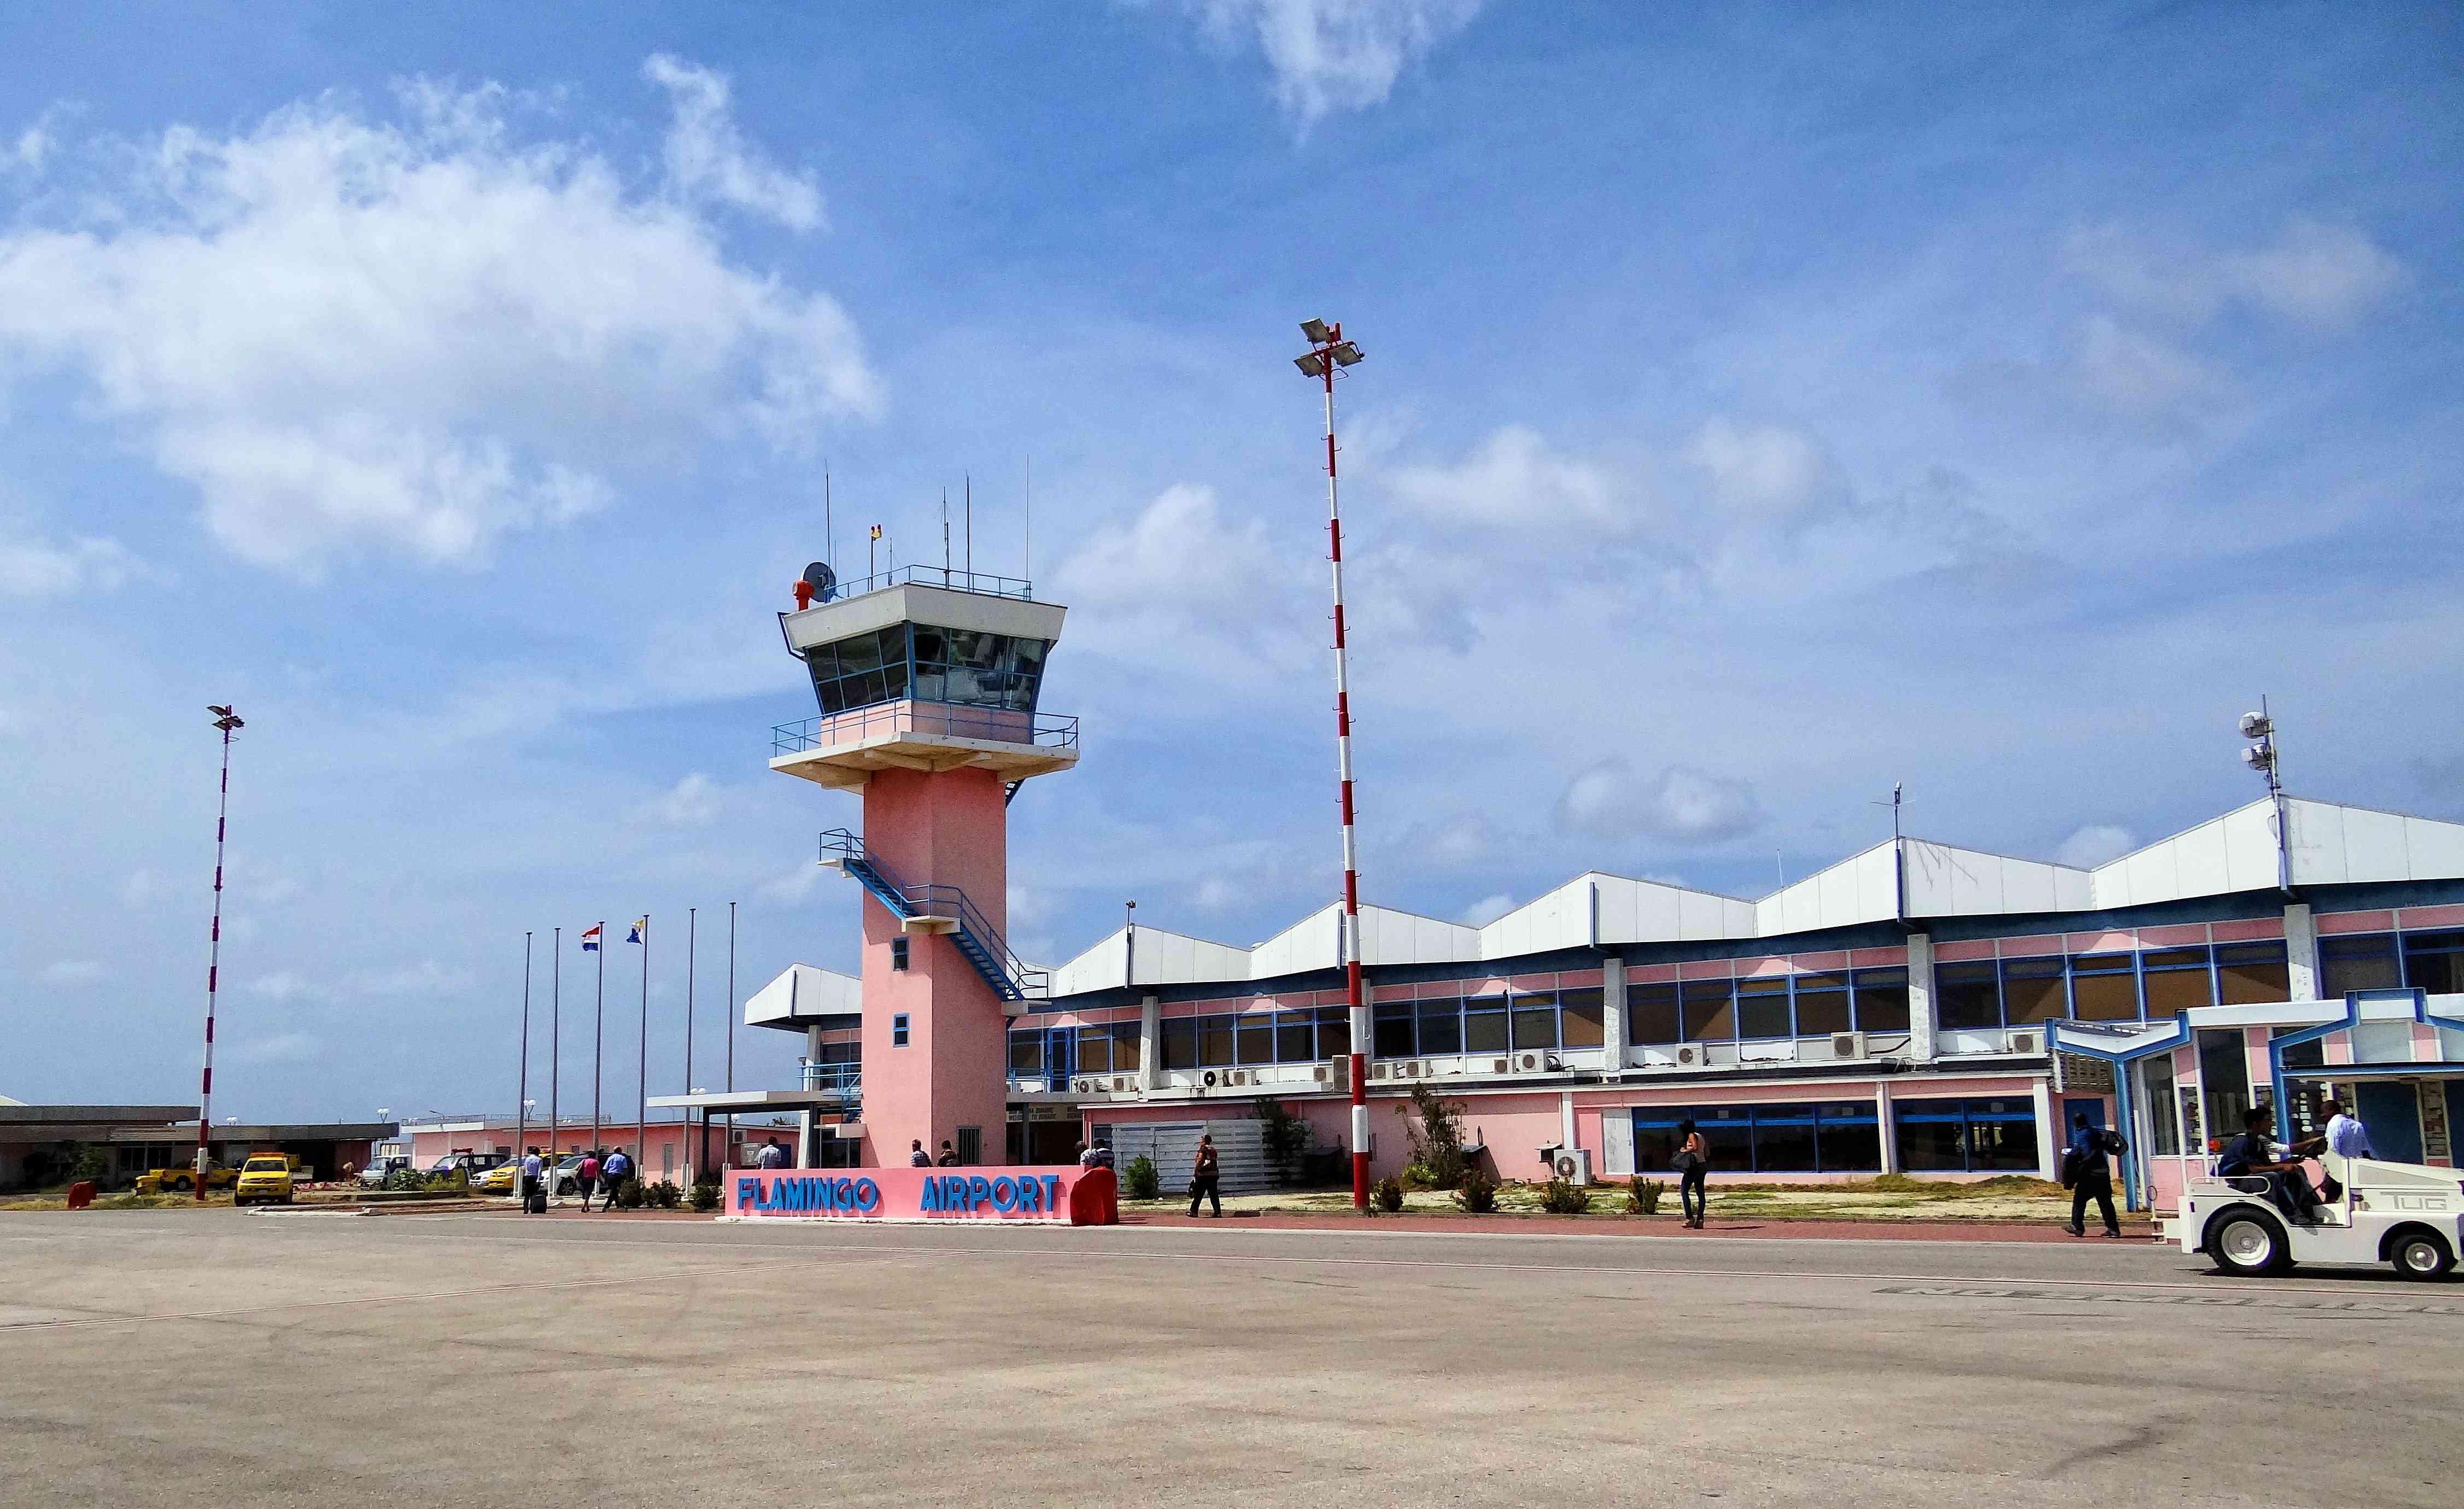 Flamingo International Airport